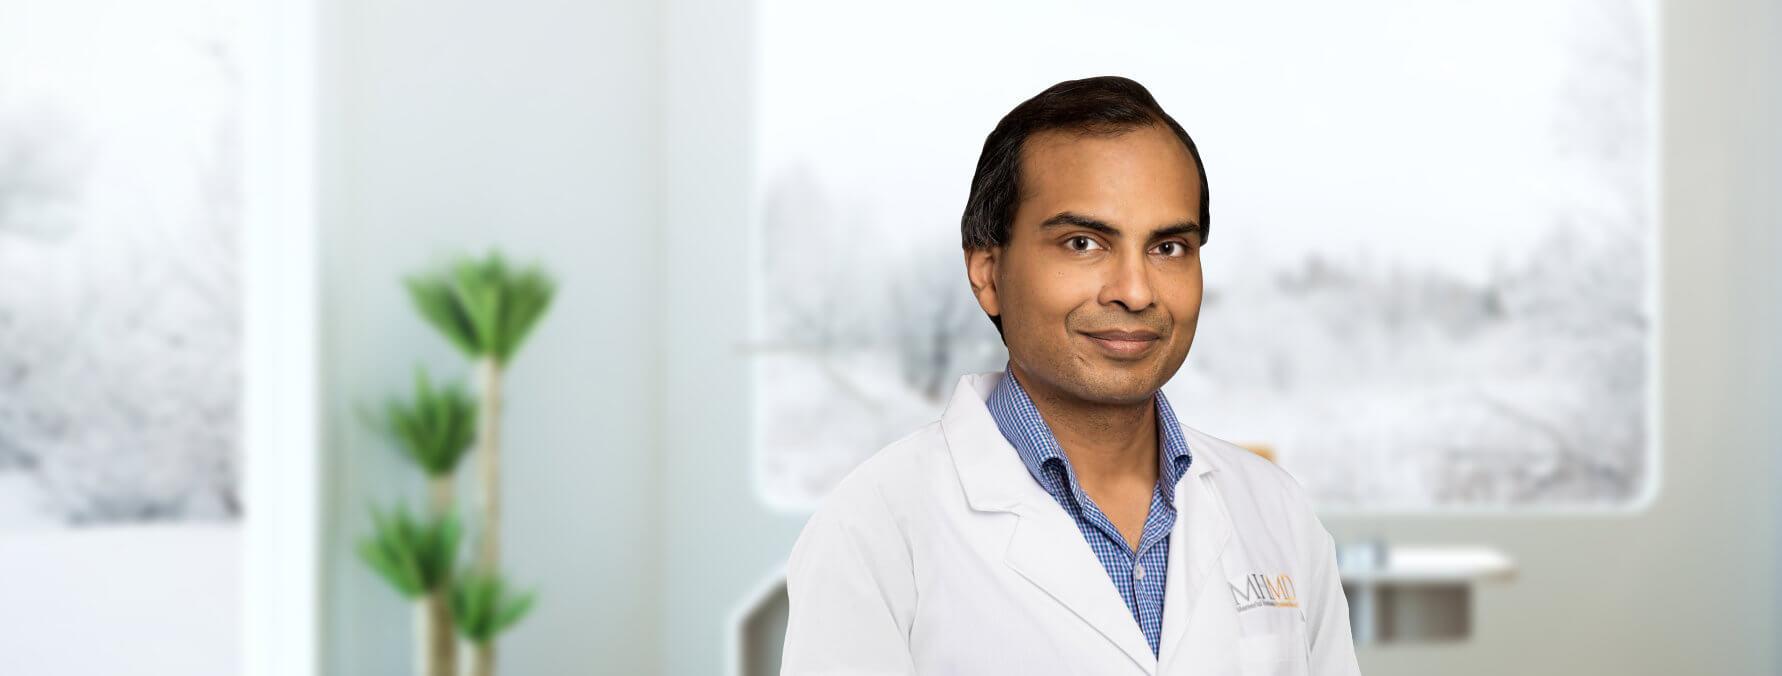 portrait of a rheumatologist